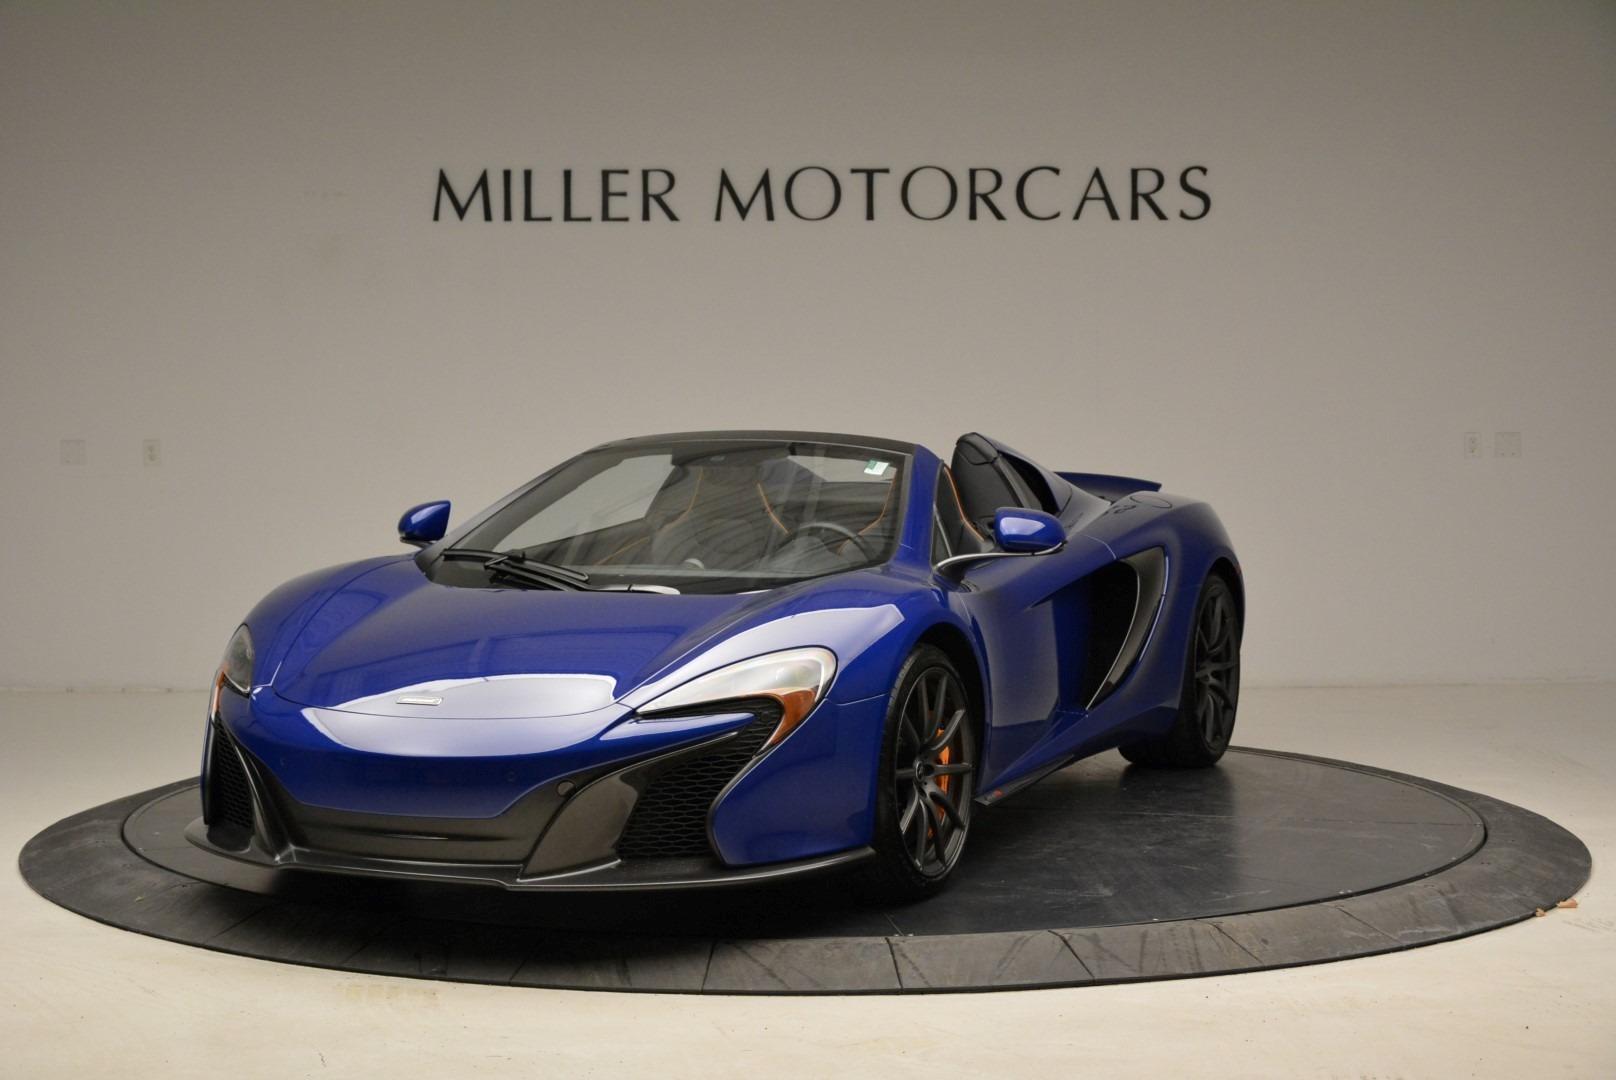 Used 2016 McLaren 650S Spider for sale Sold at Maserati of Westport in Westport CT 06880 1